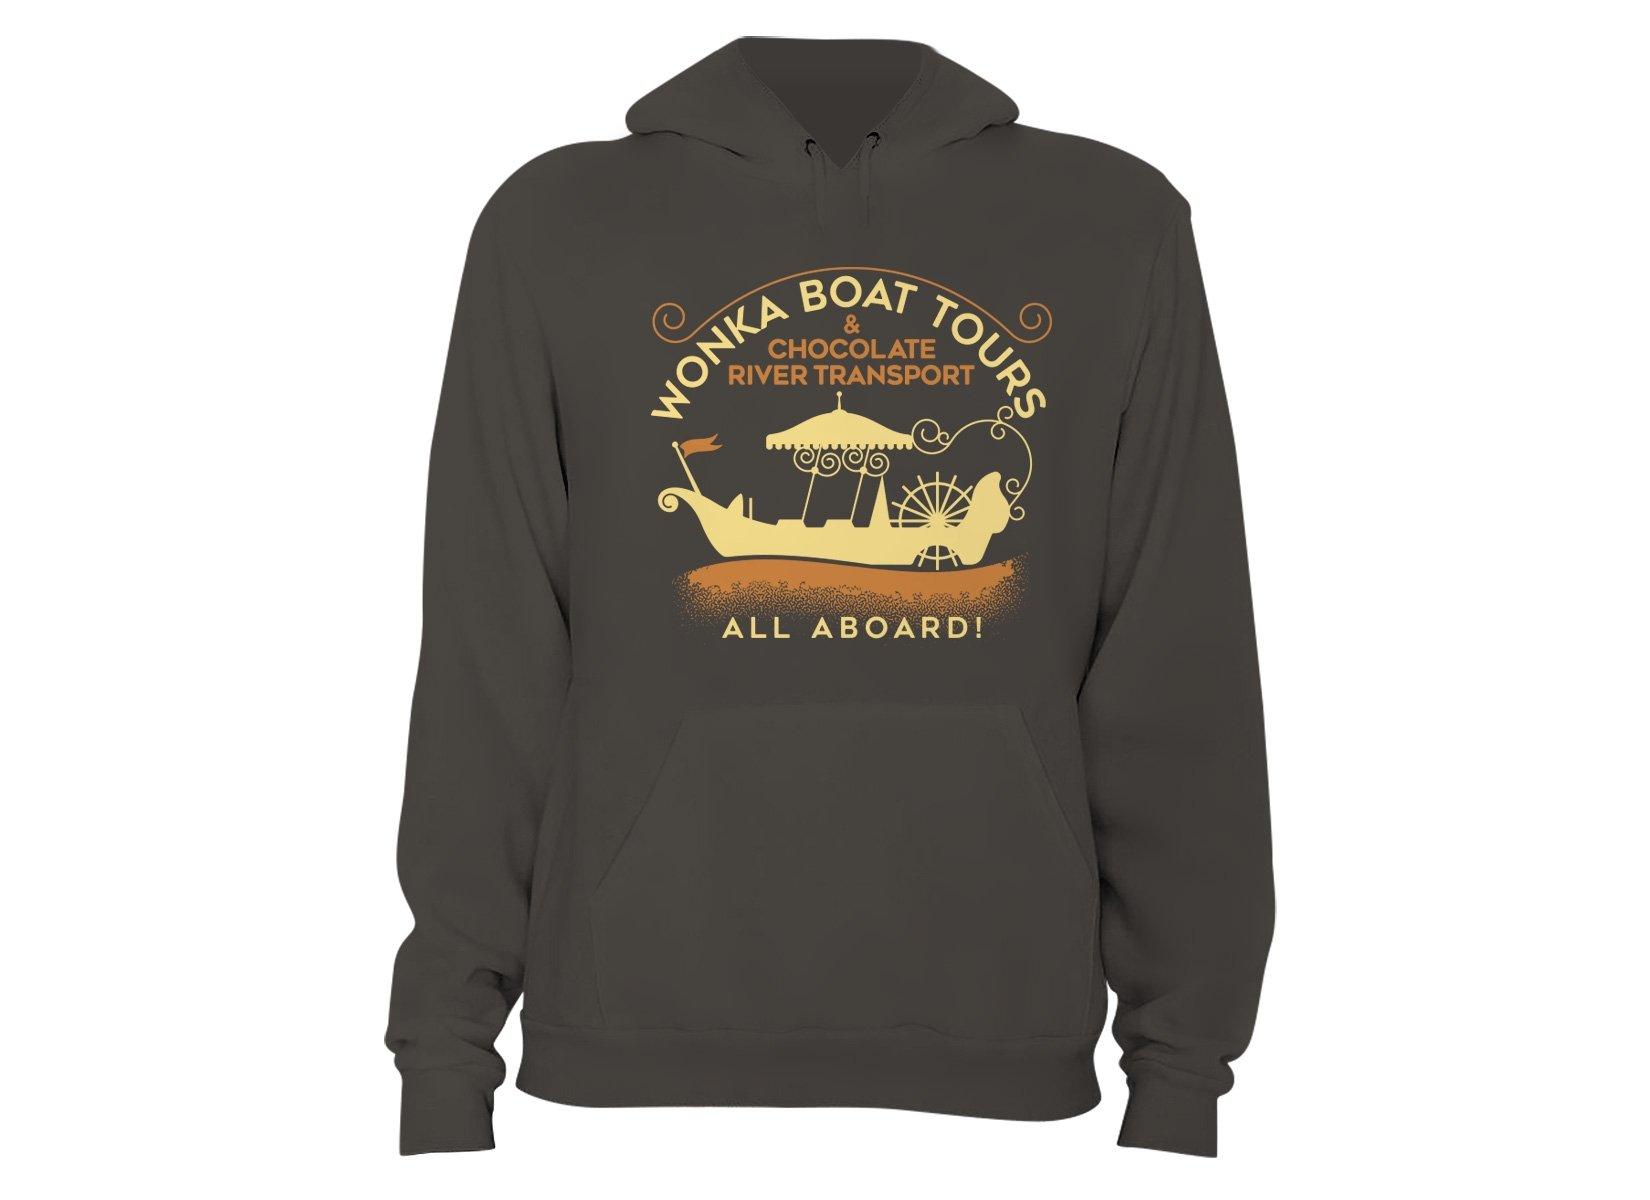 Wonka Boat Tours on Hoodie